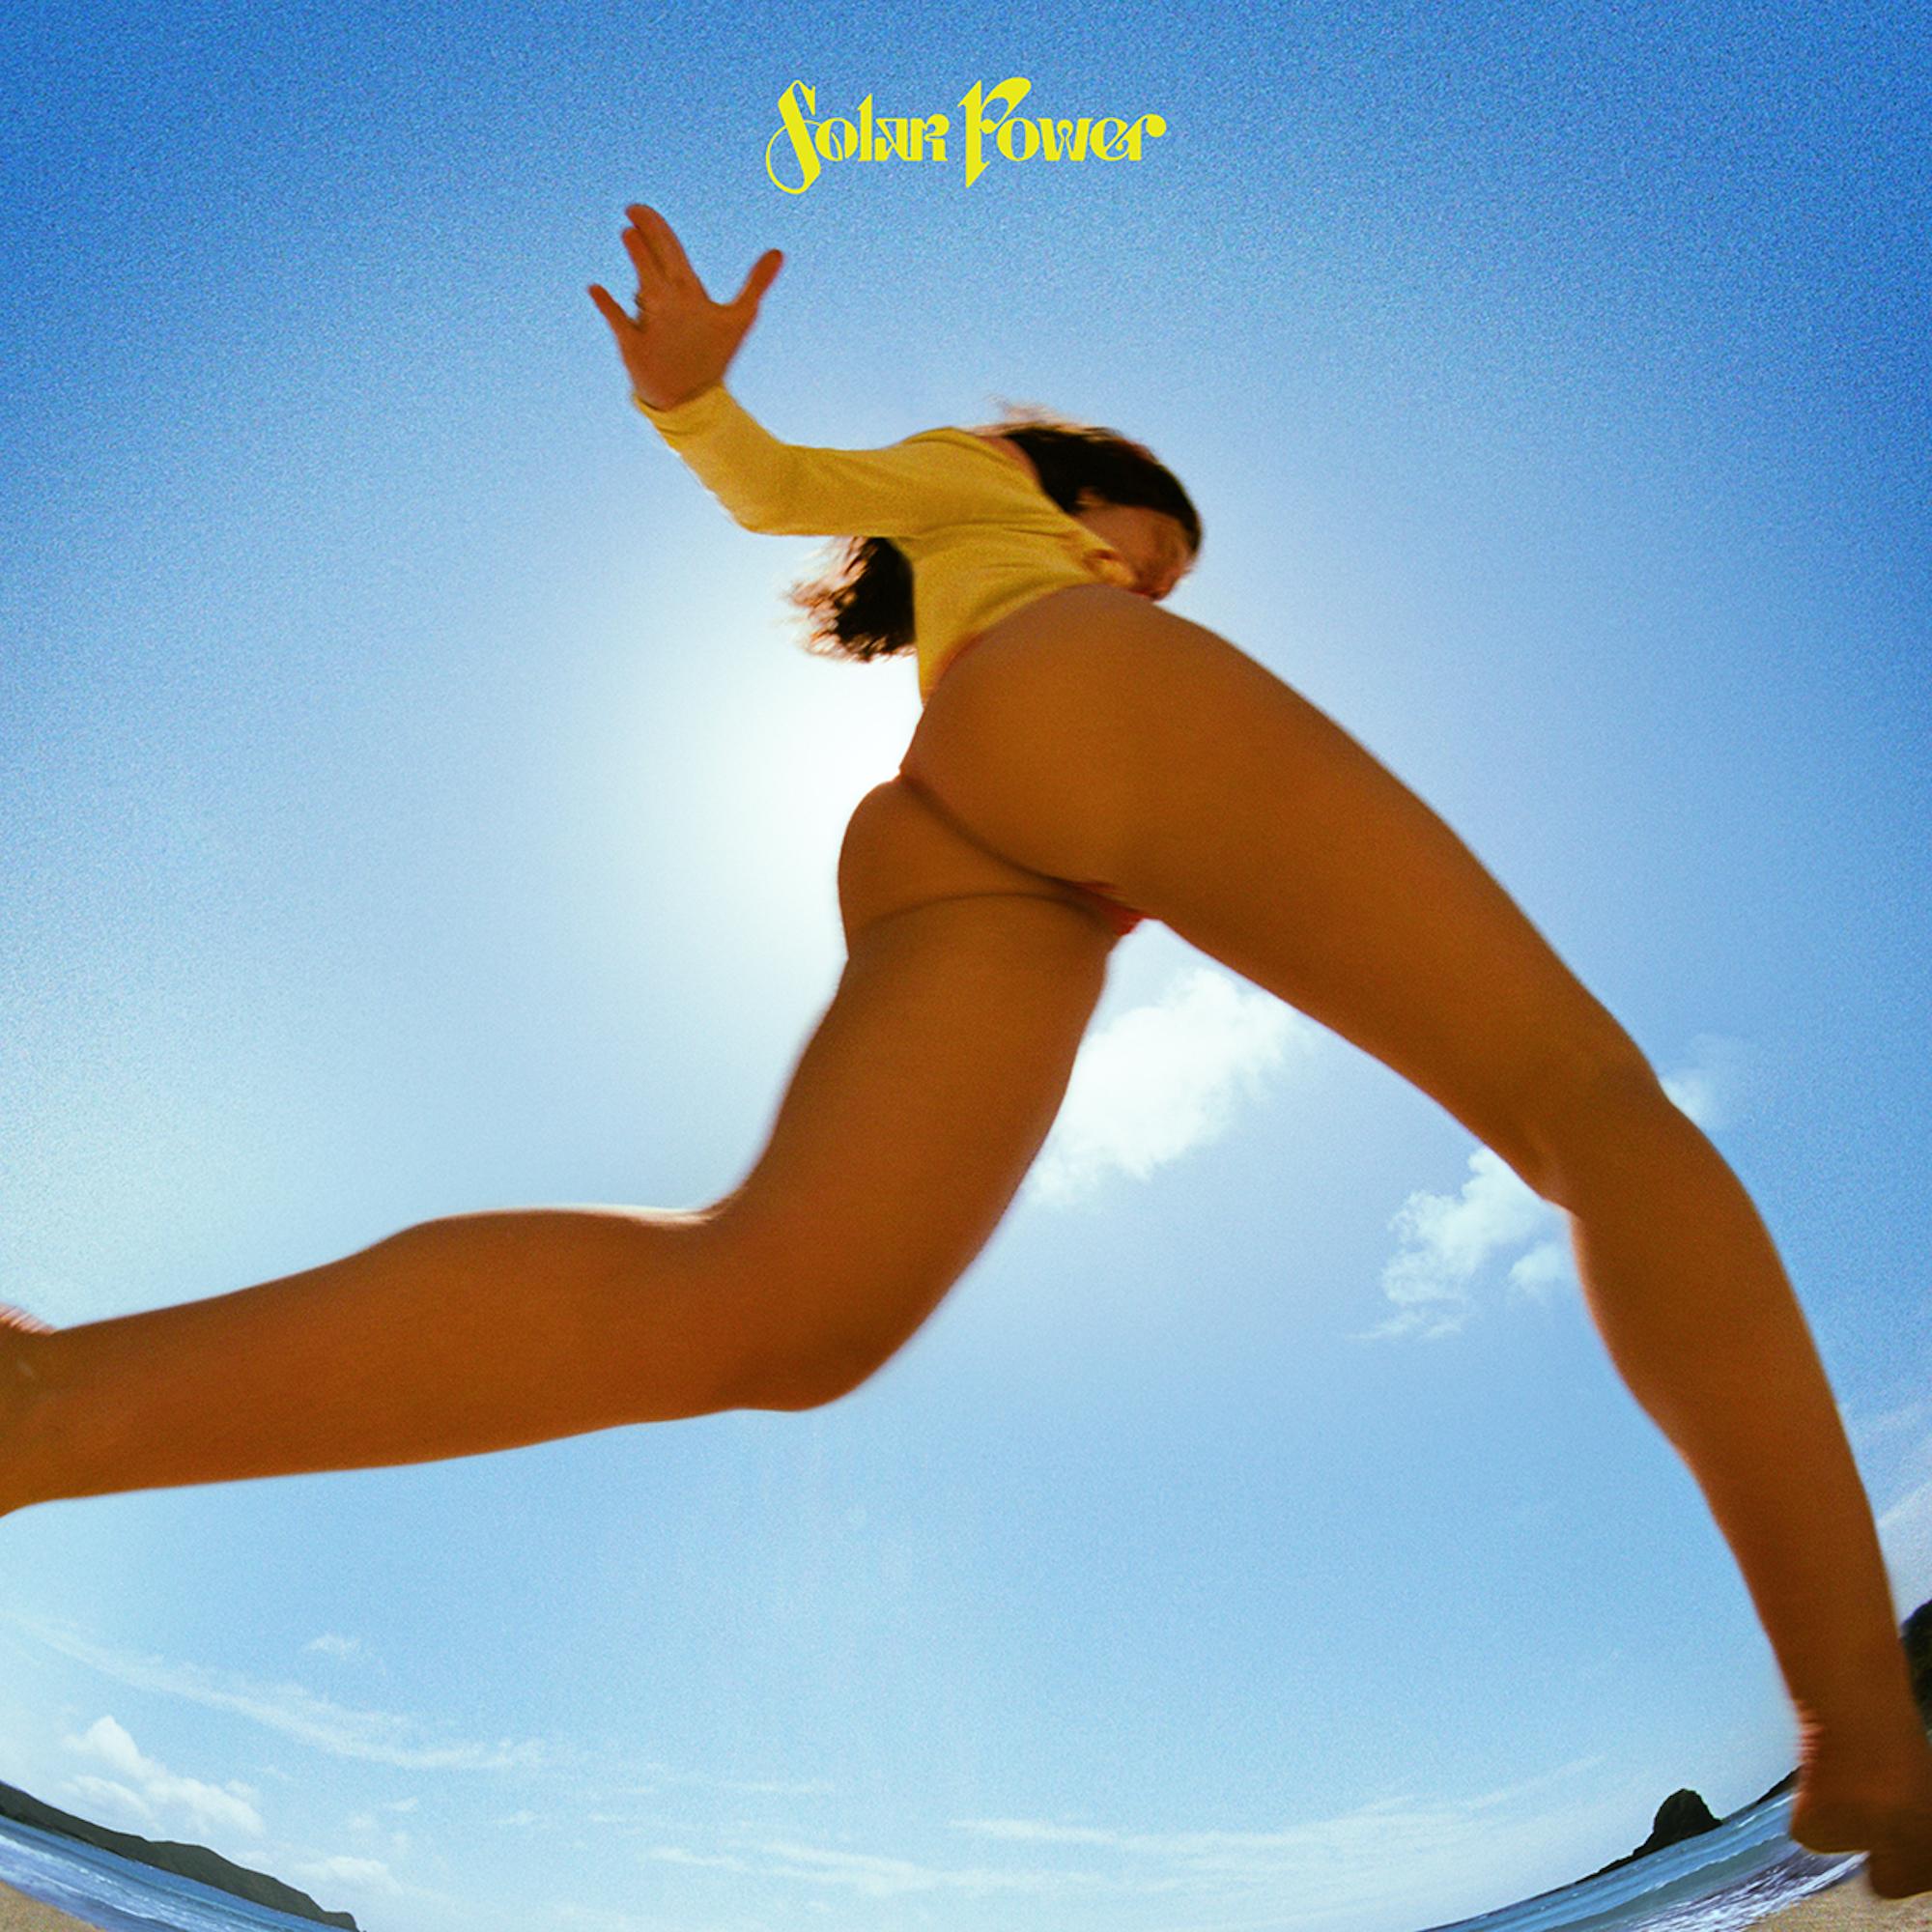 lorde artwork album solar power